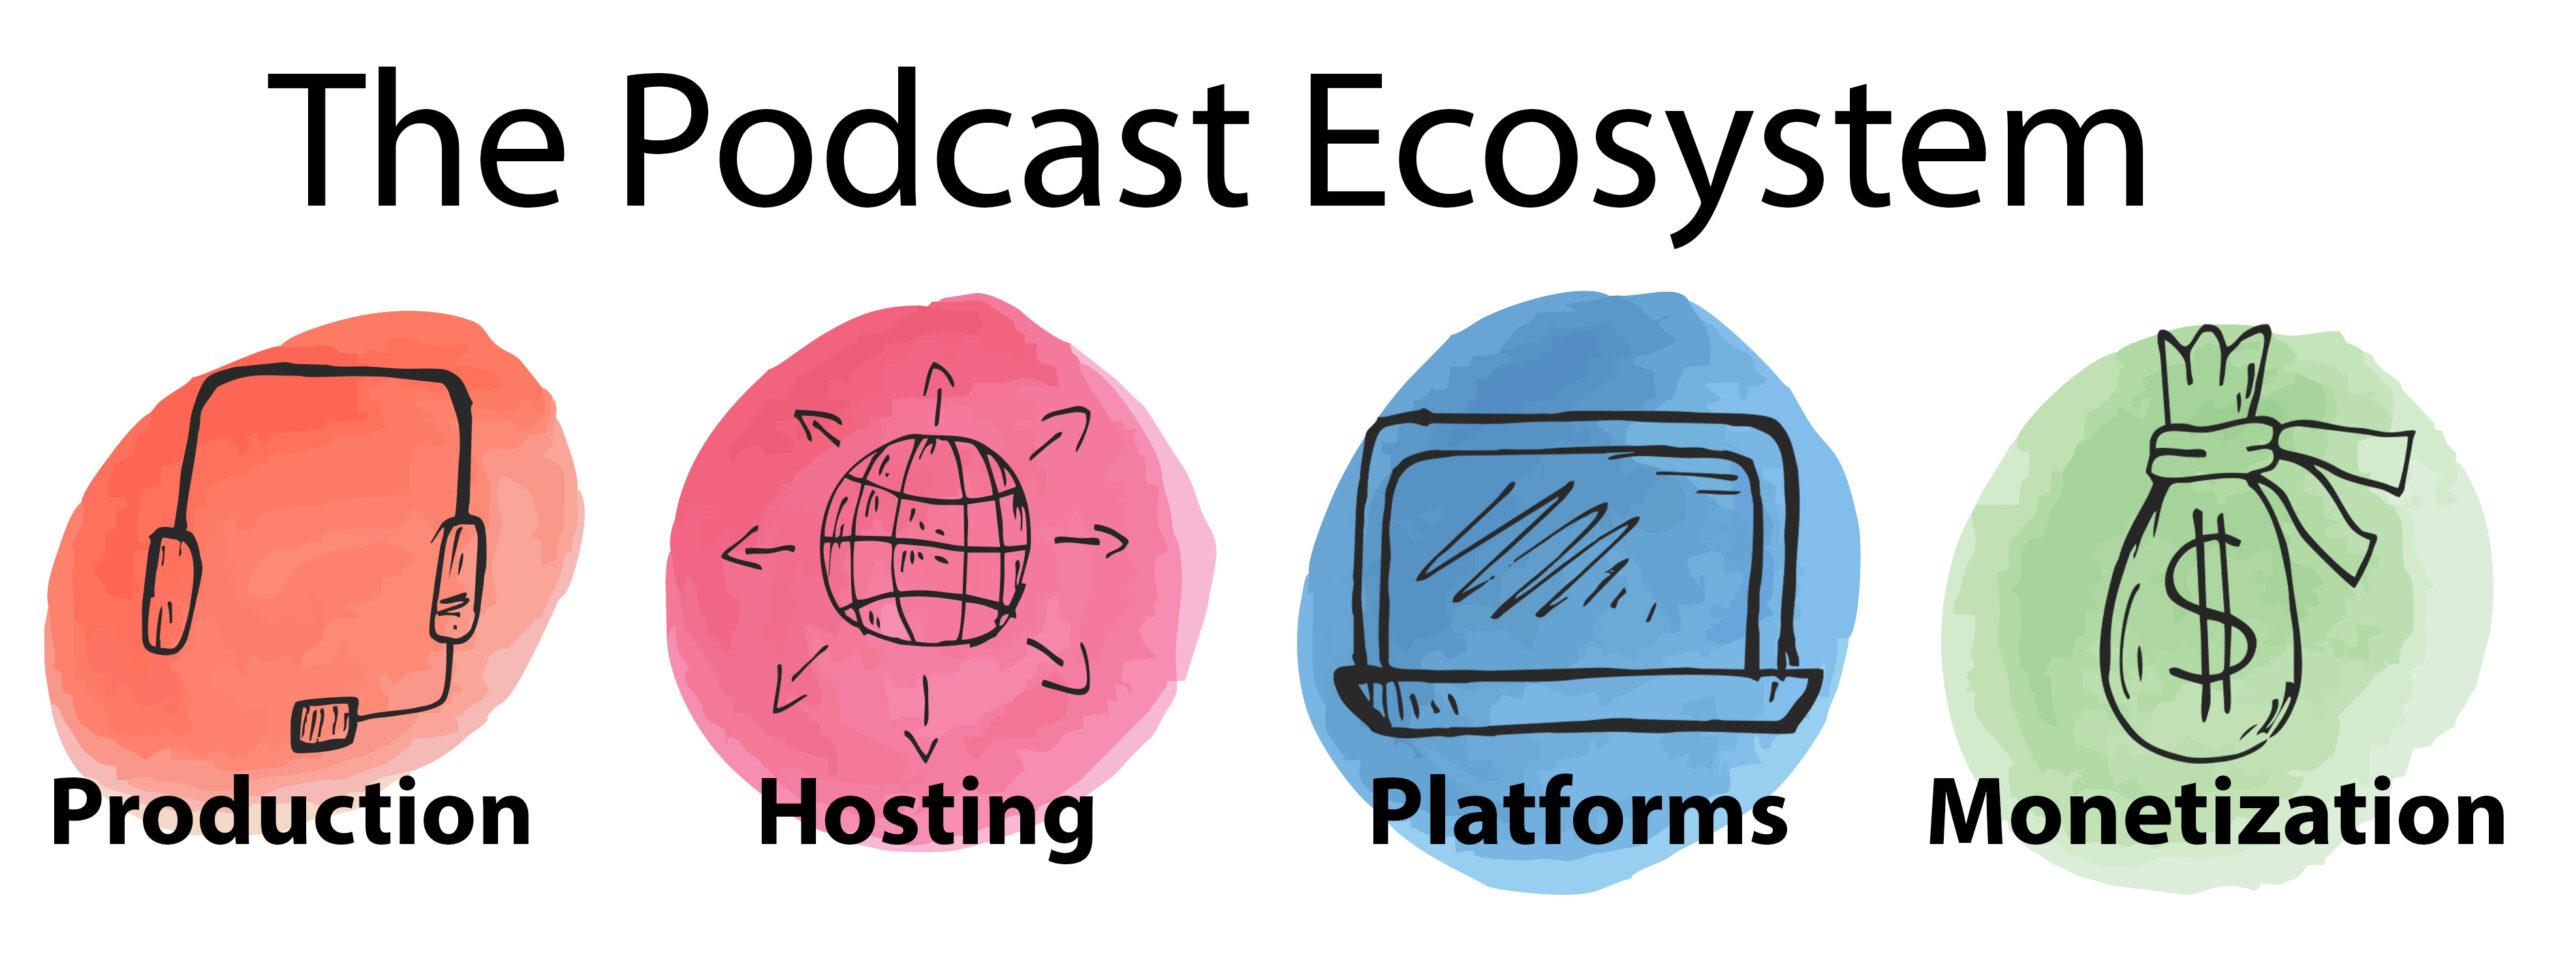 The Podcast Ecosystem: Production, Hosting, Platforms, Monetization